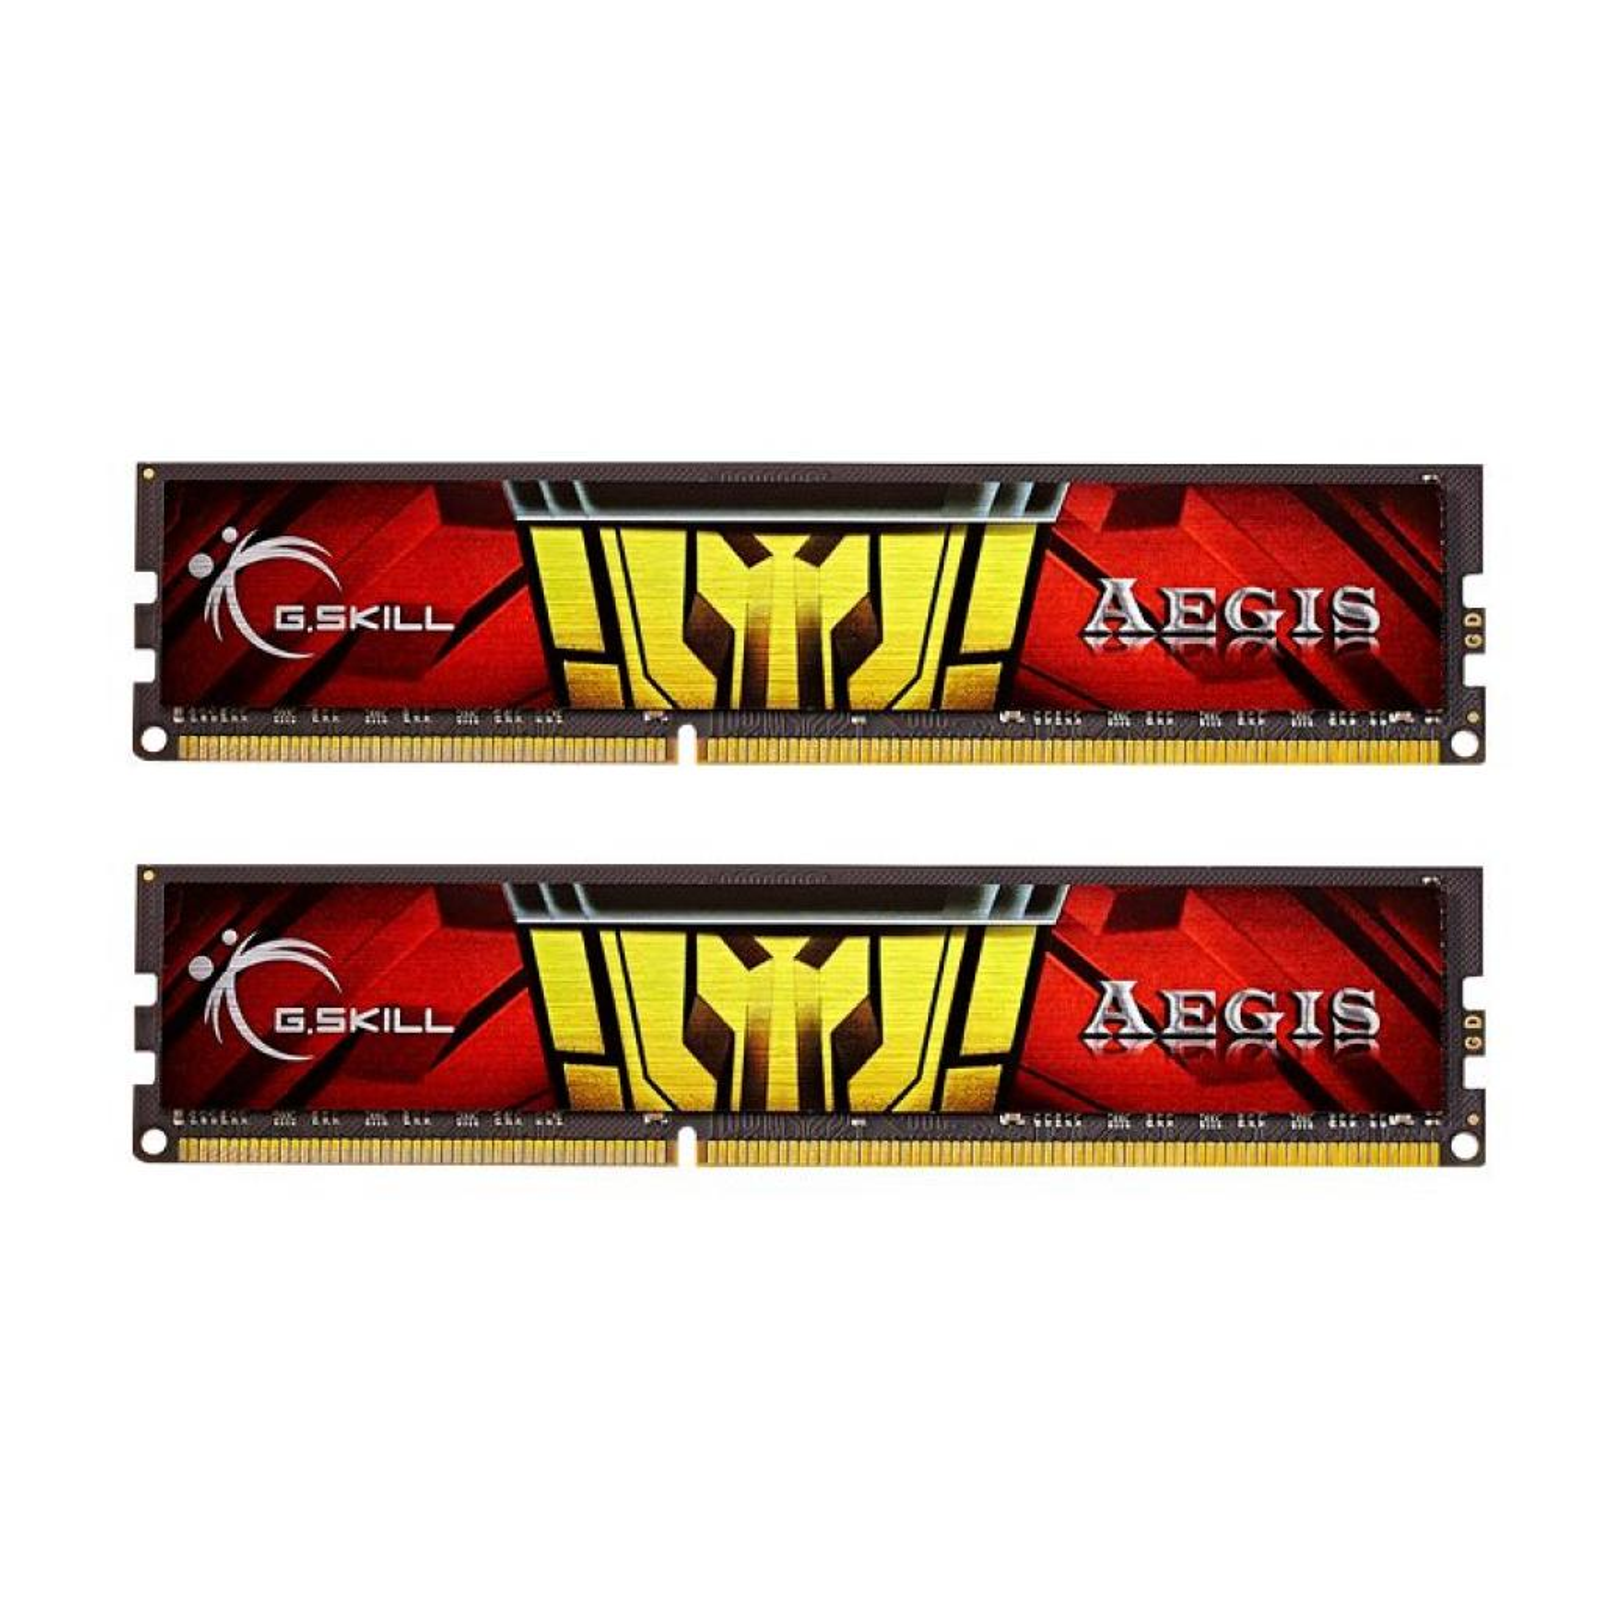 Модуль памяти для компьютера DDR3 8GB (2x4GB) 1333 MHz G.Skill (F3-1333C9D-8GIS)